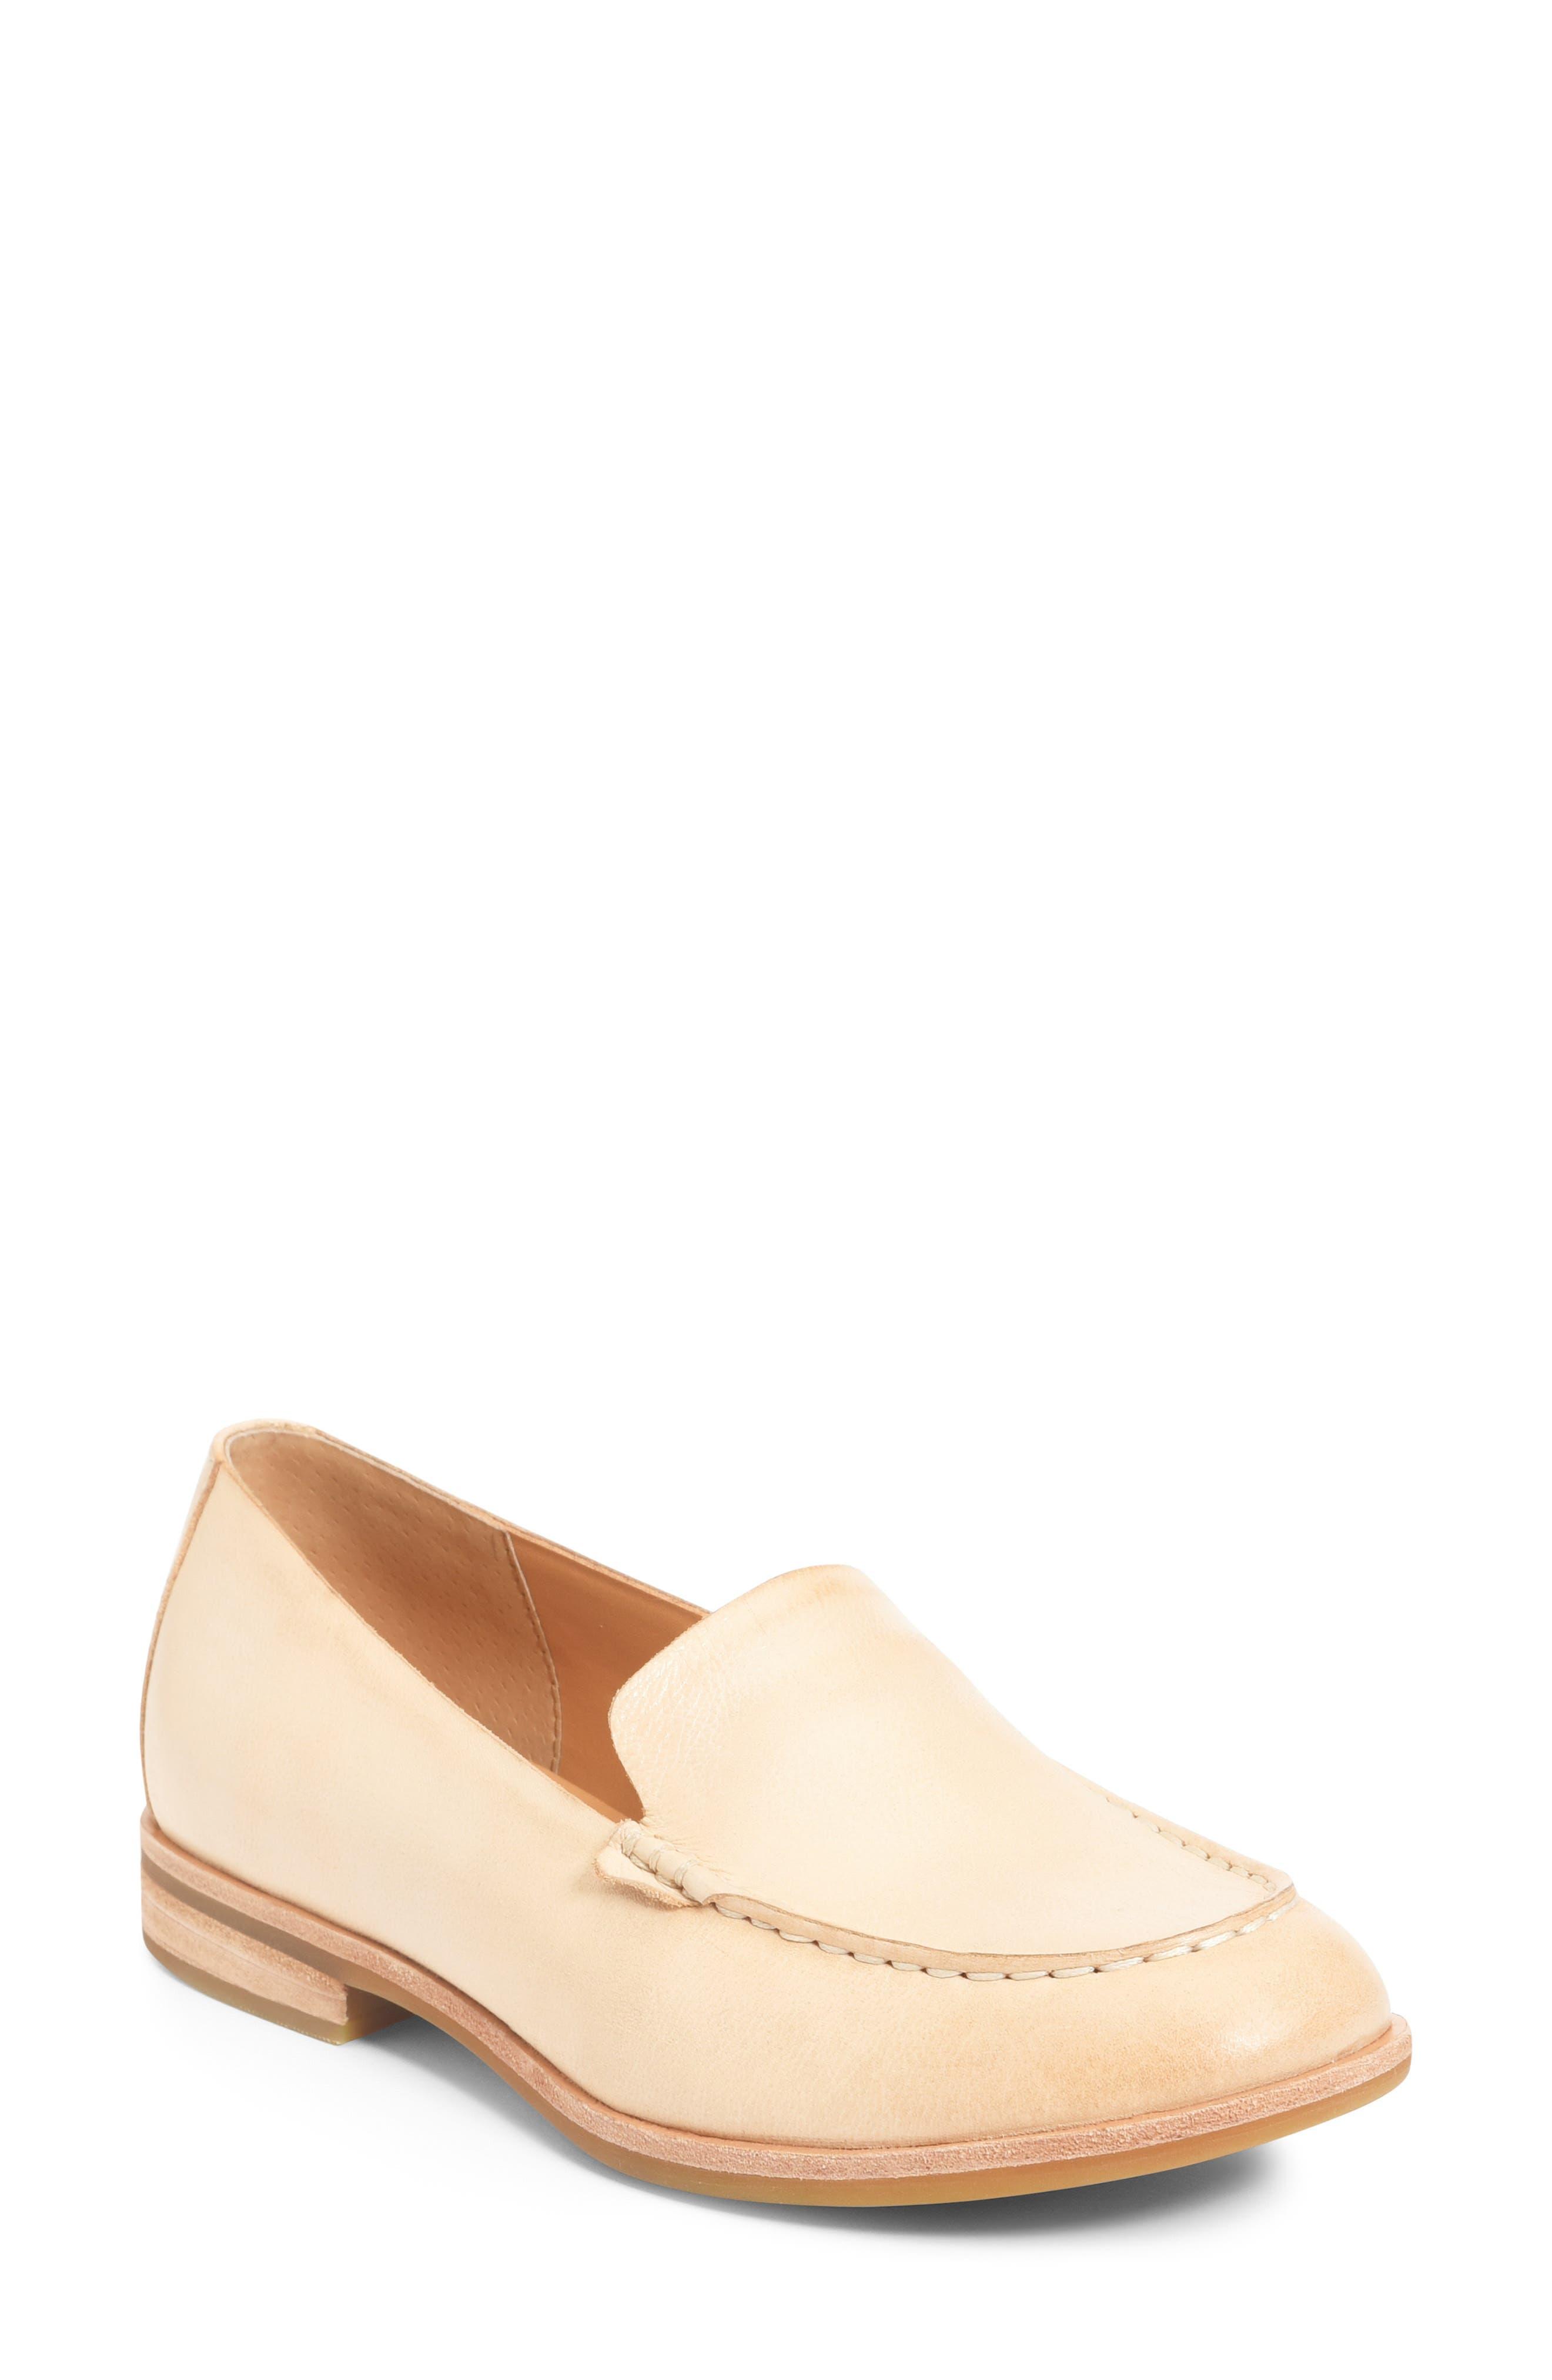 Women's Kork-Ease Moc Toe Flat